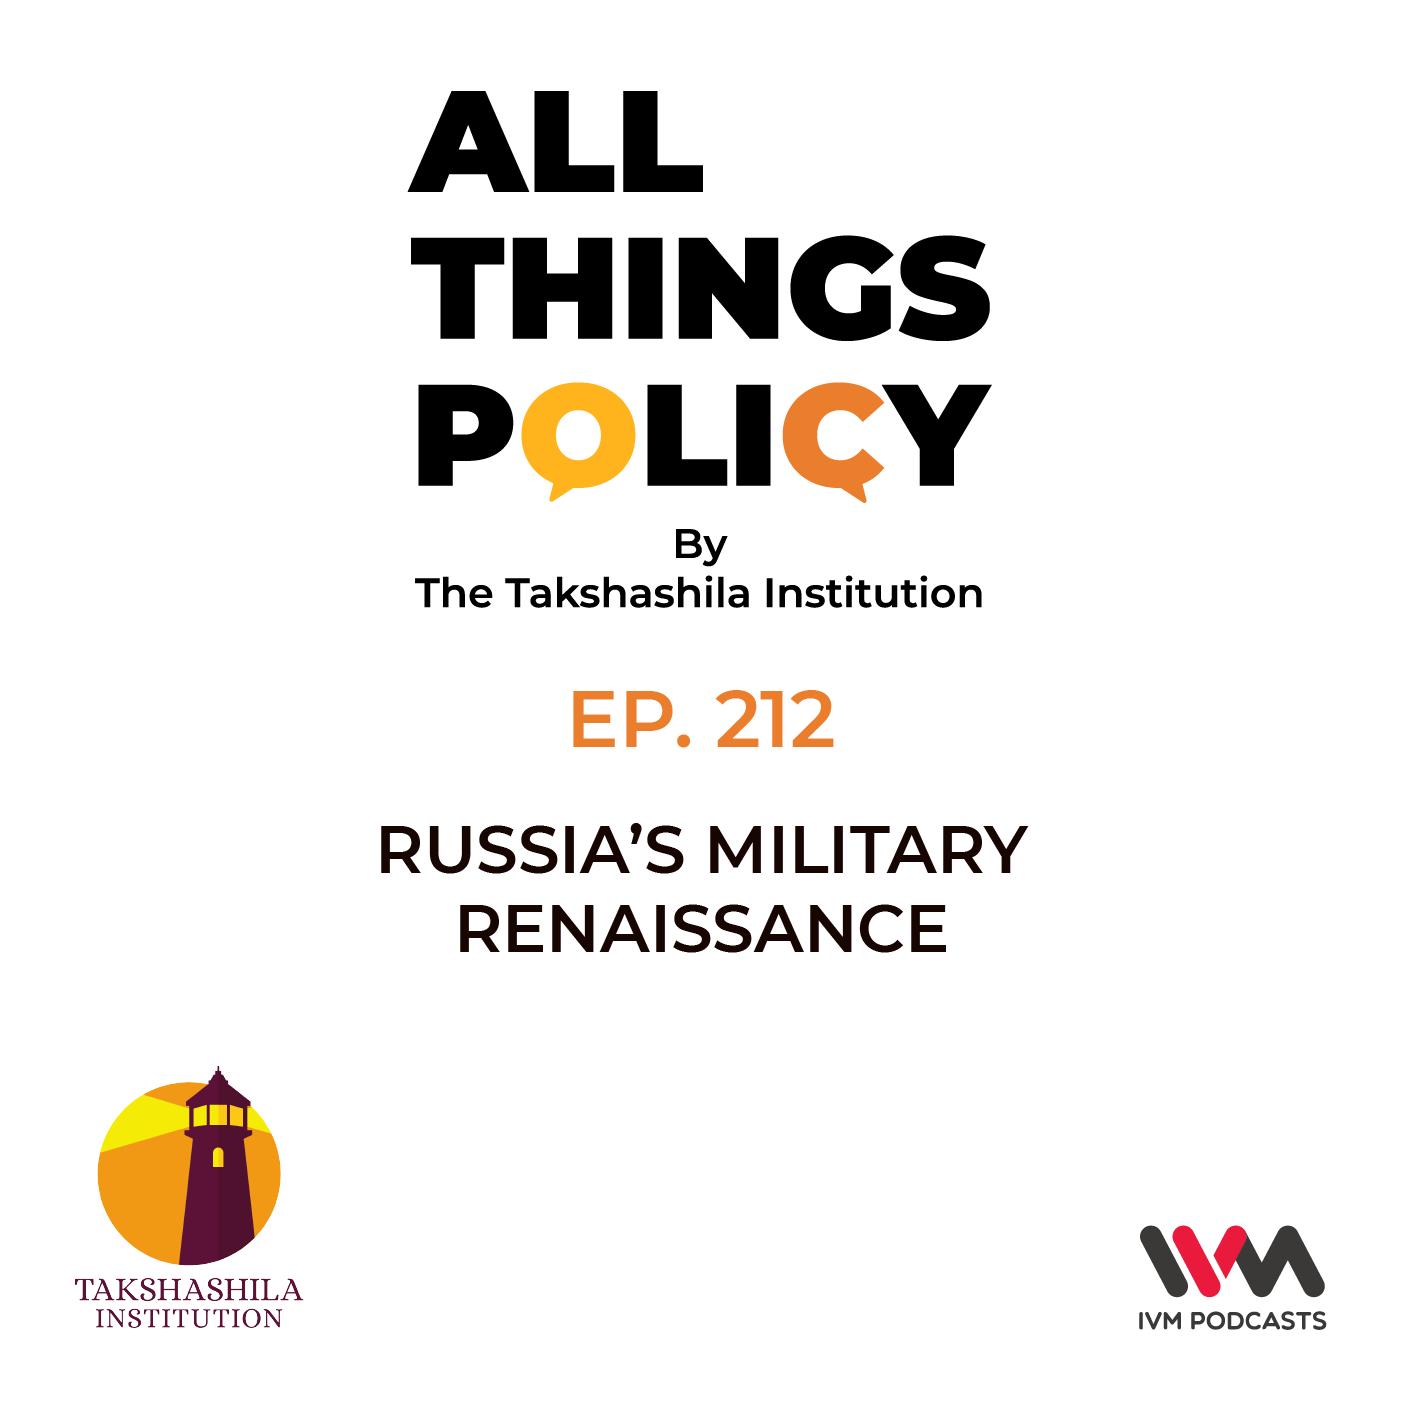 Ep. 212: Russia's Military Renaissance